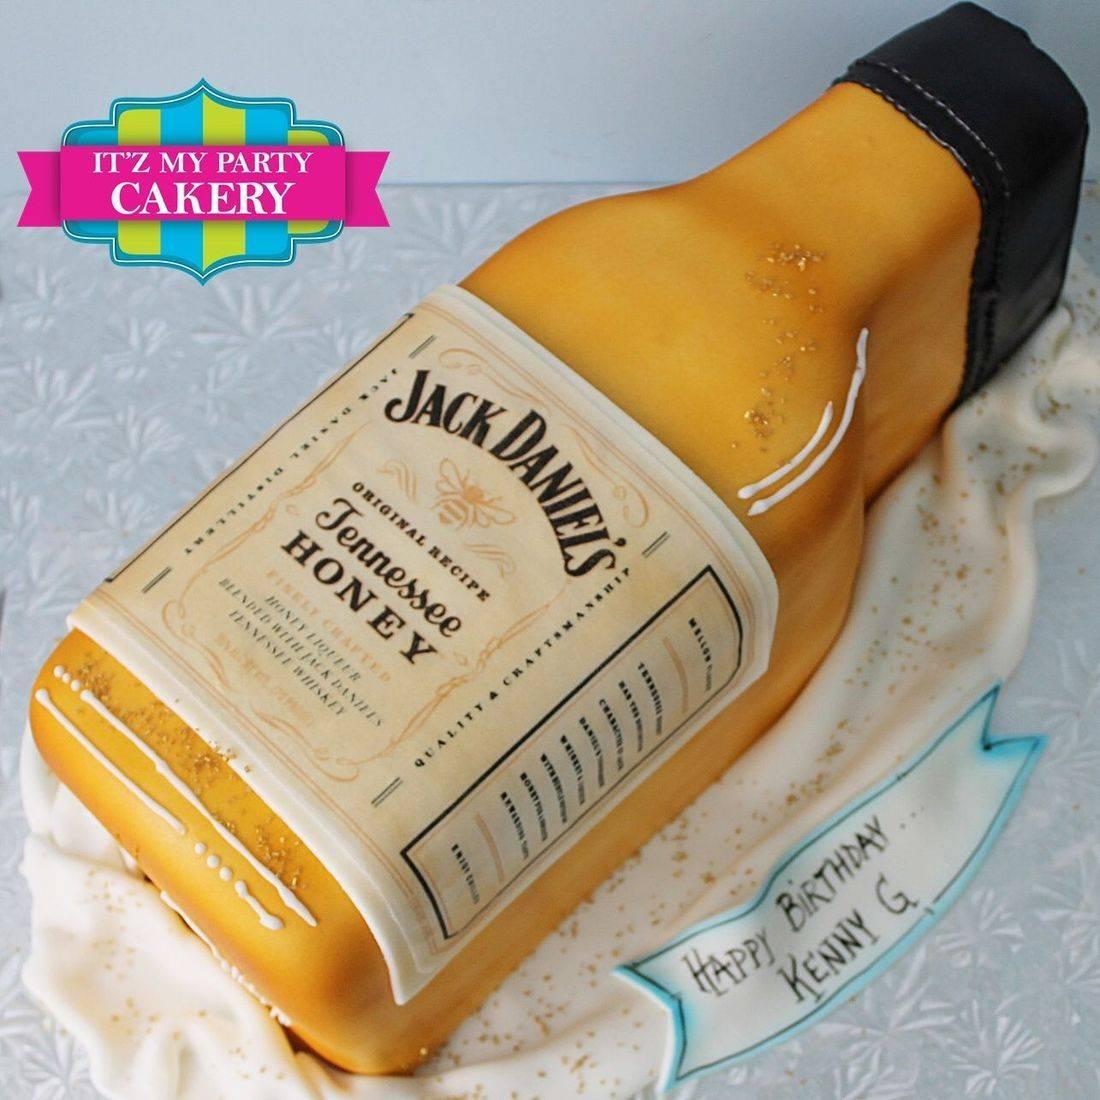 Jack Daniels Honey Bottle  Carved Dimensional Cake Milwaukee